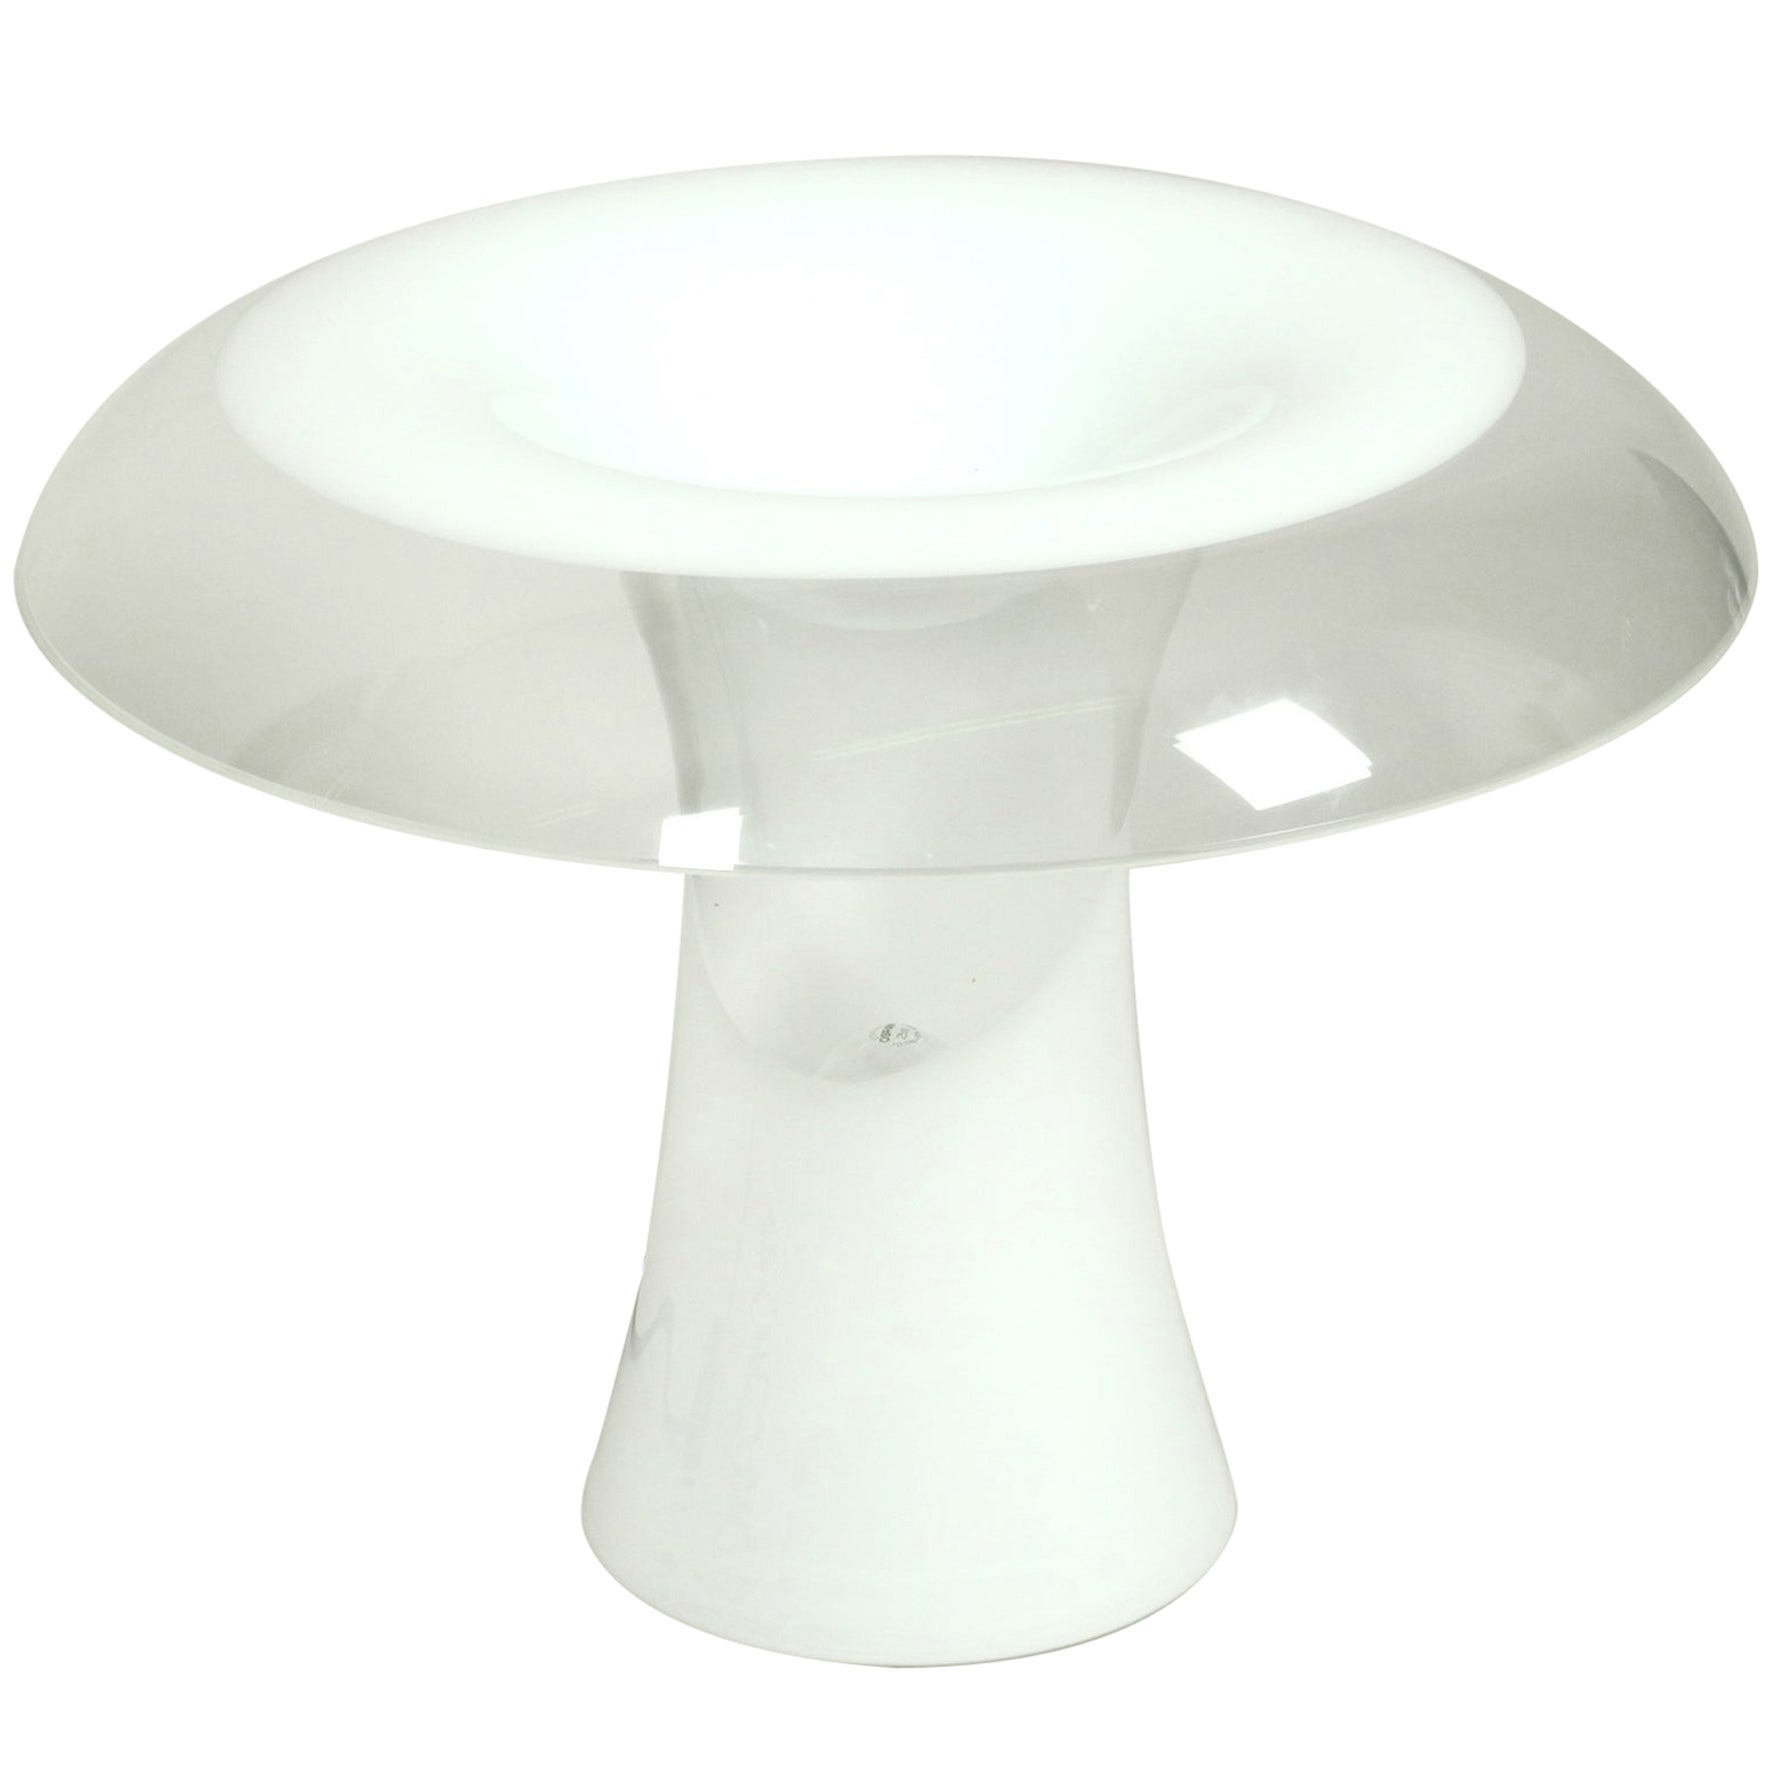 Huge 1960s Italian Two-Piece Murano Glass Mushroom Table Lamp by Vistosi